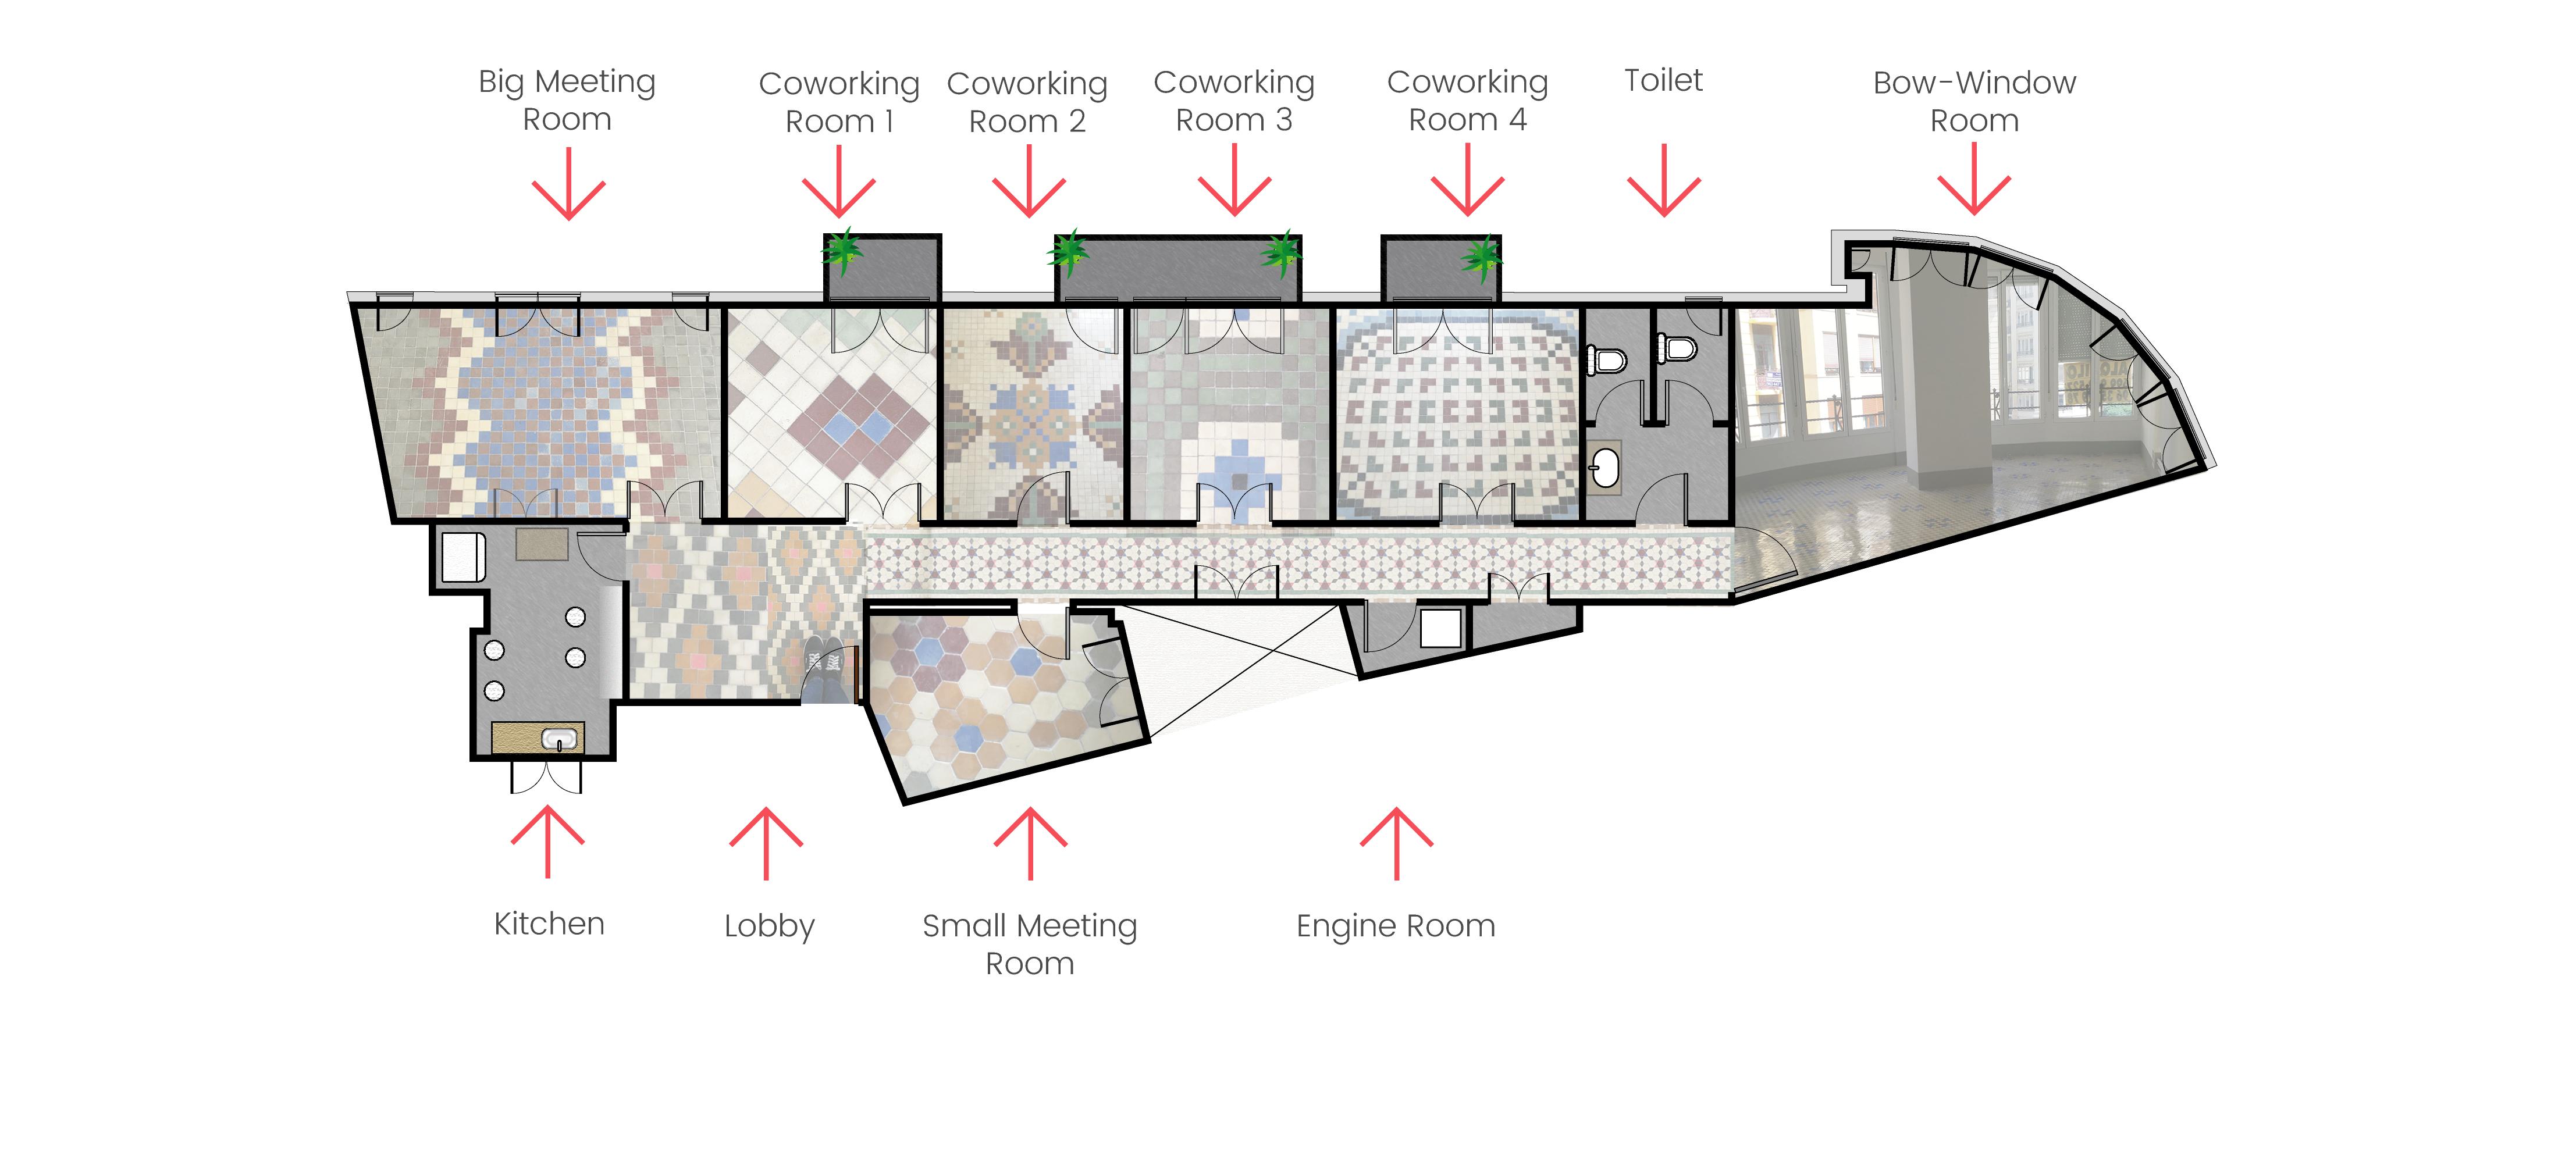 Plano Mosaico Coworking